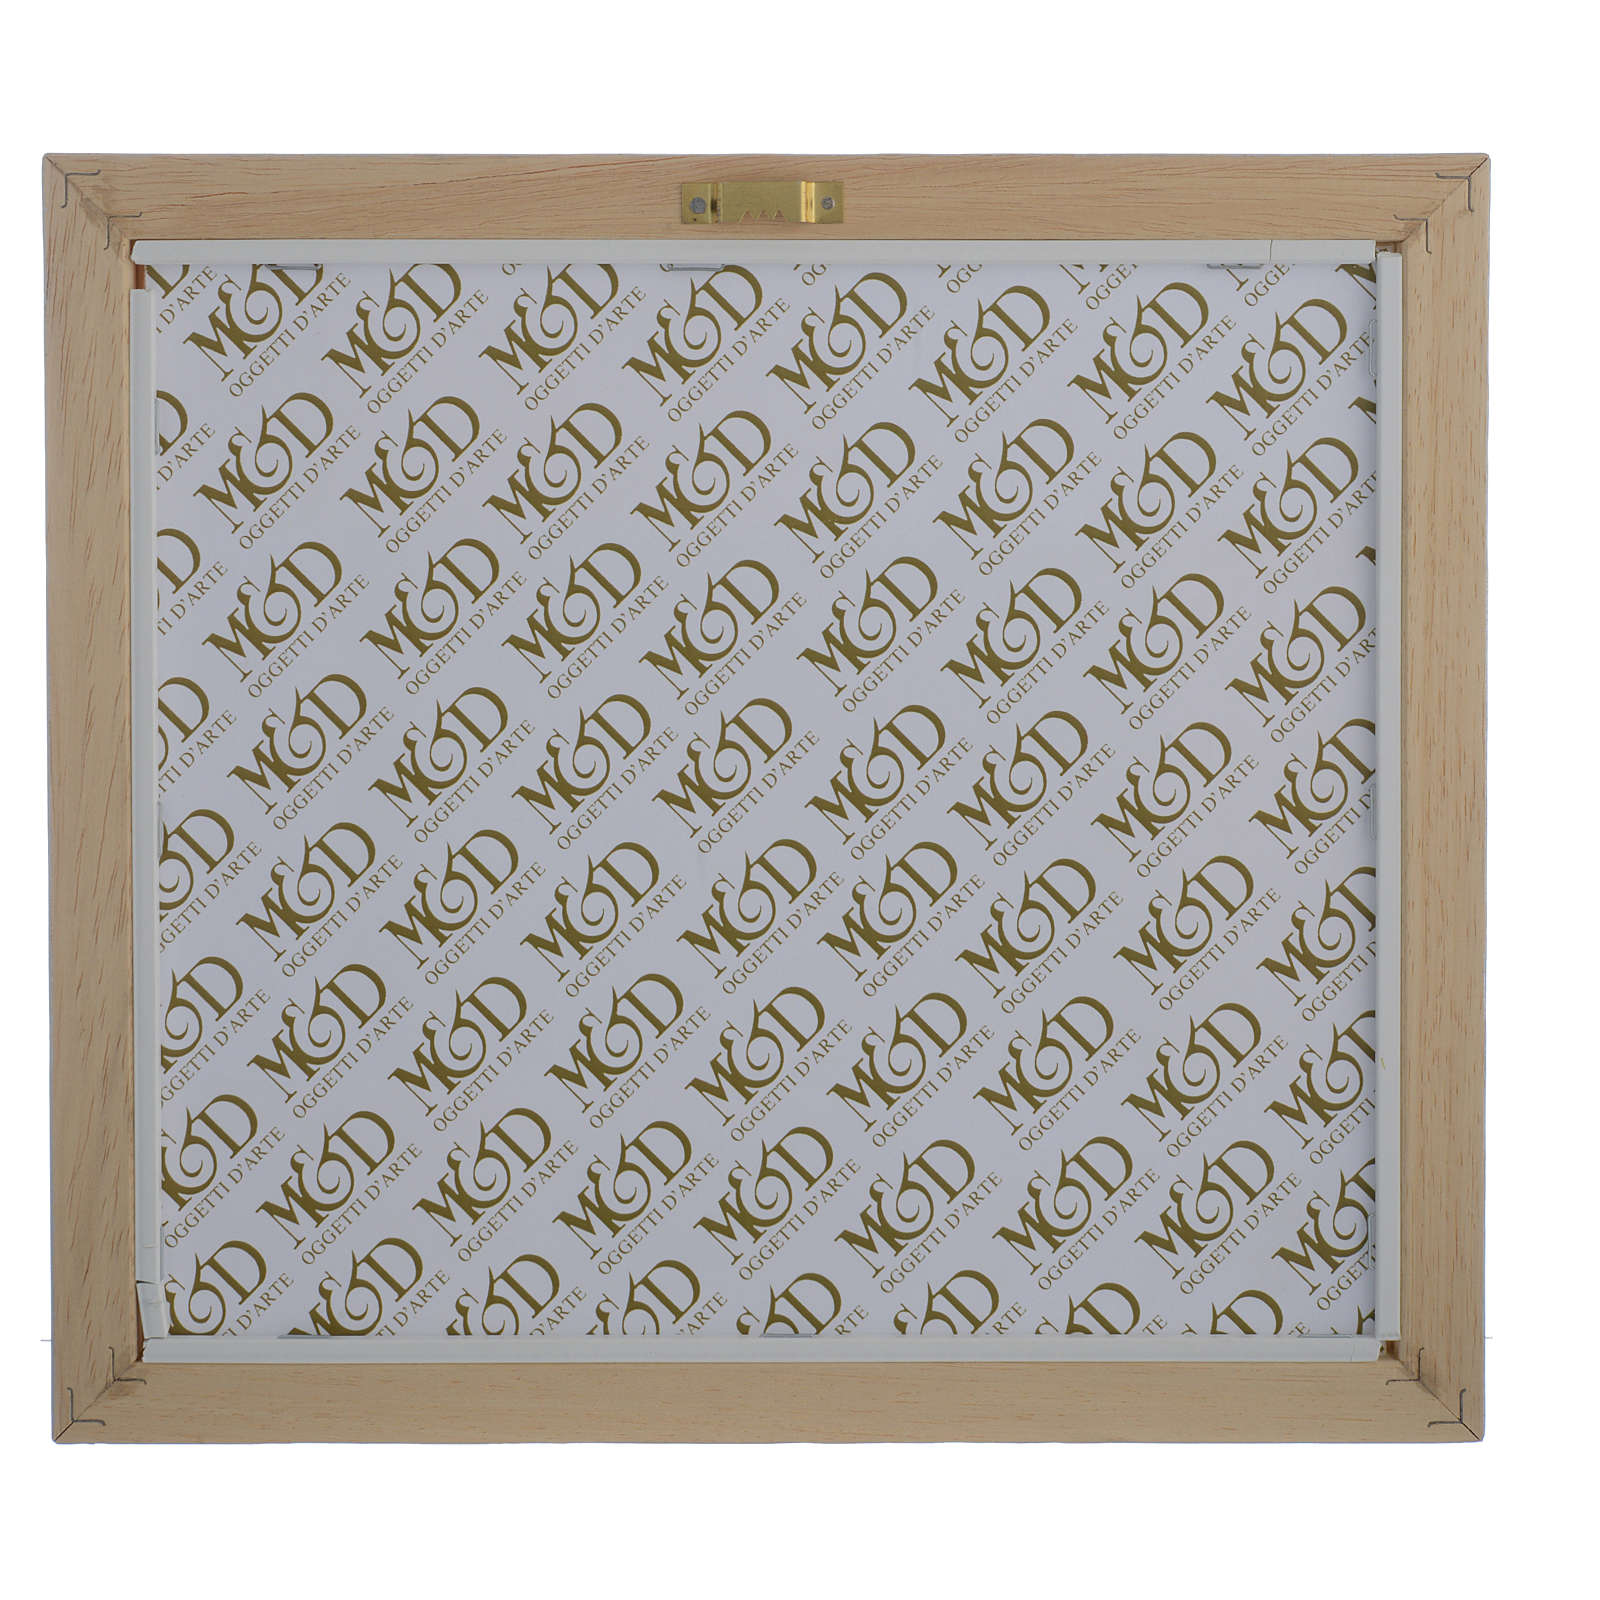 Quadro Matrimonio S. Famiglia Avorio-tabacco 29x26 cm 3